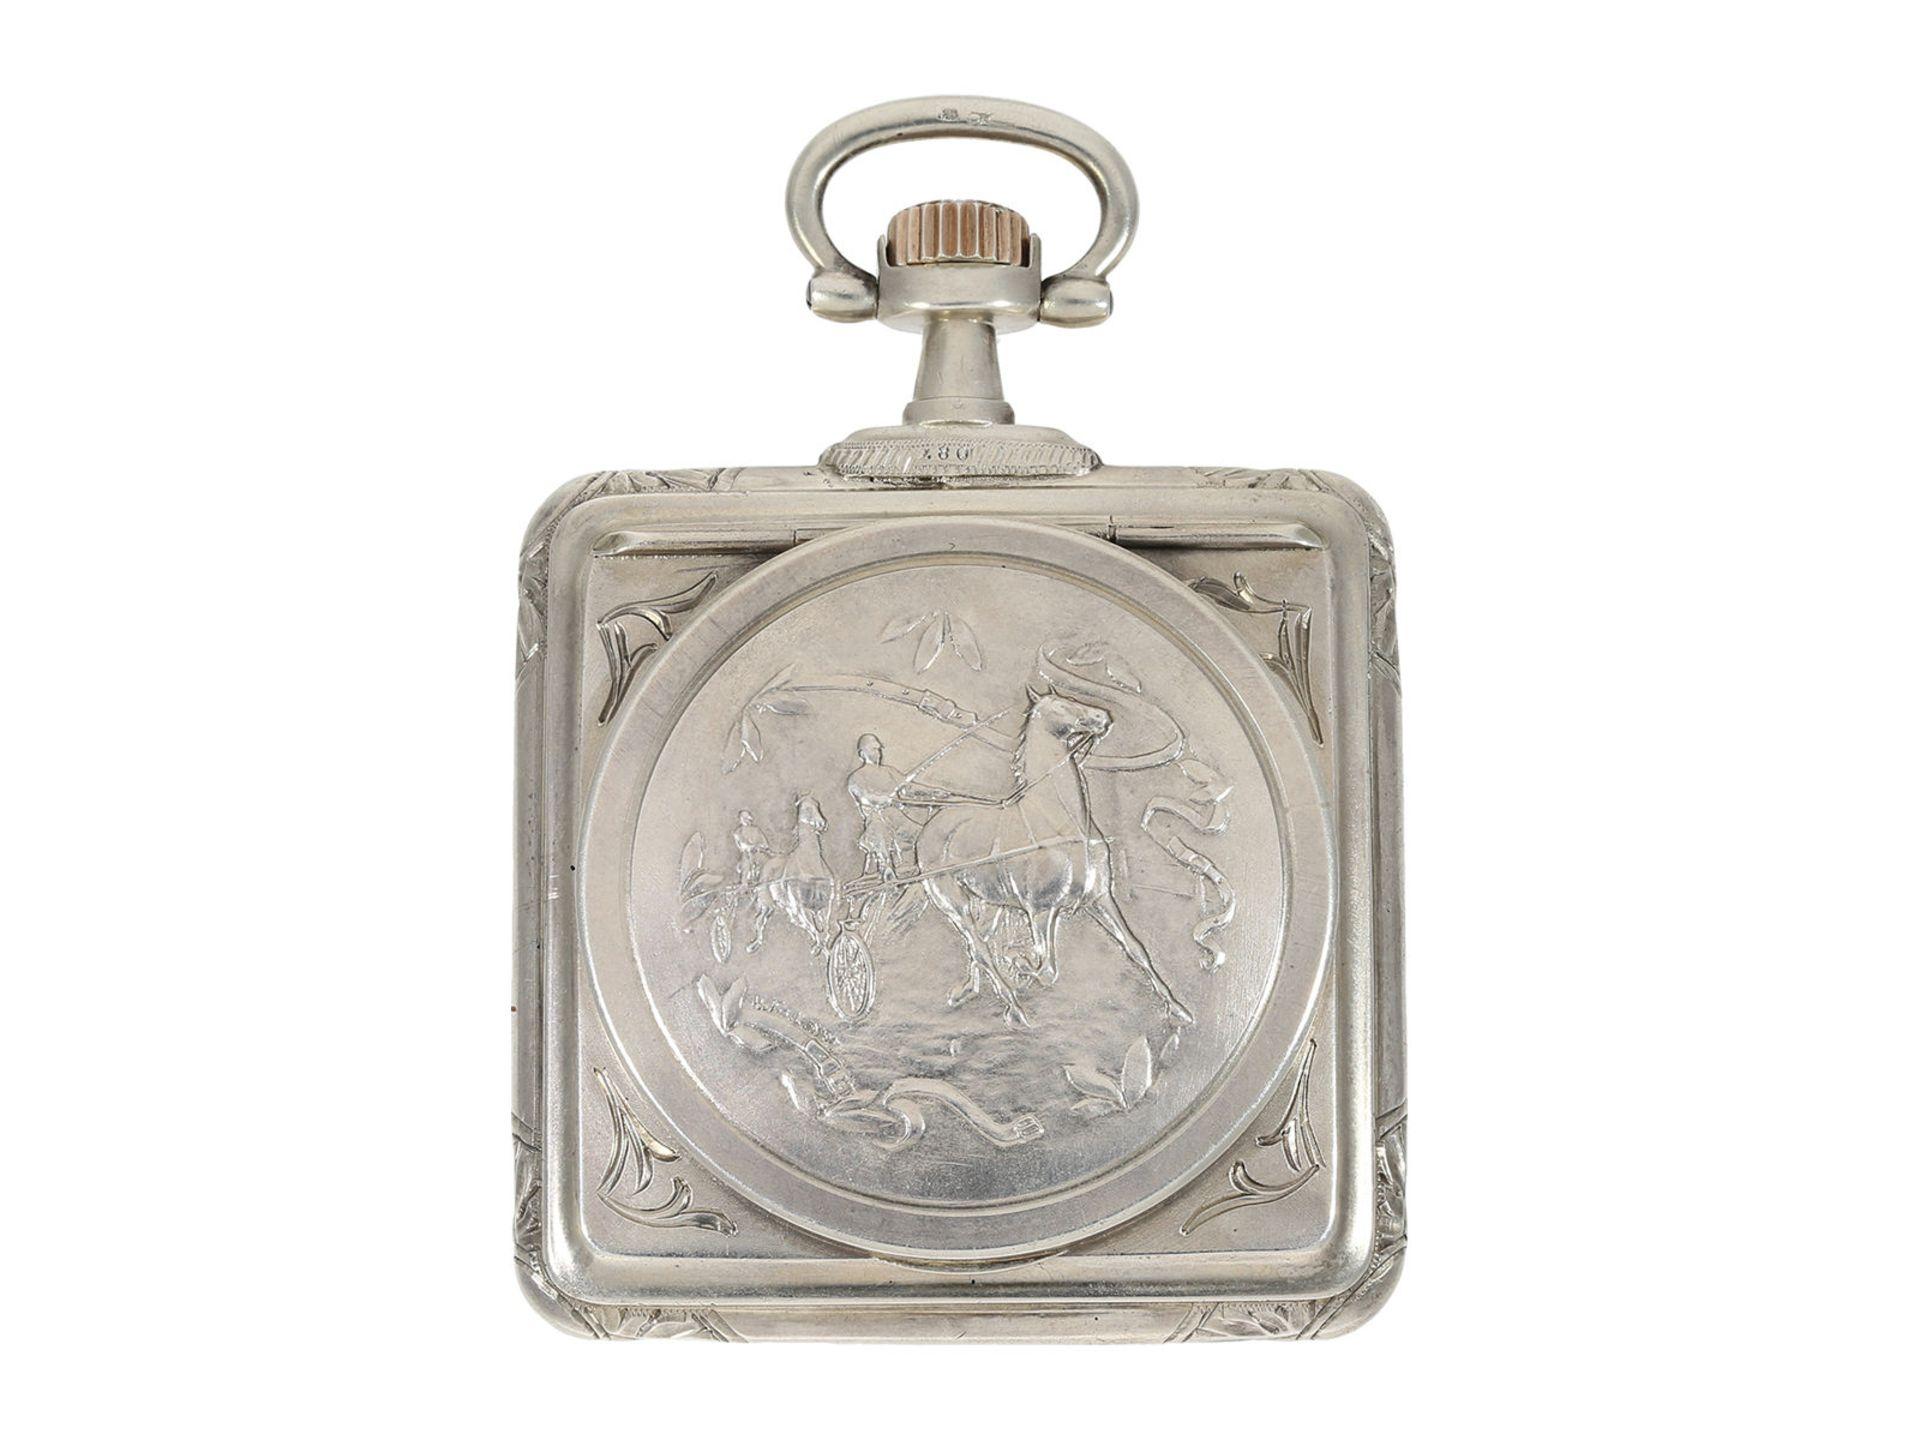 Pocket watch: very rare square Art Nouveau Omega pocket watch, silver, ca. 1900 - Bild 2 aus 5